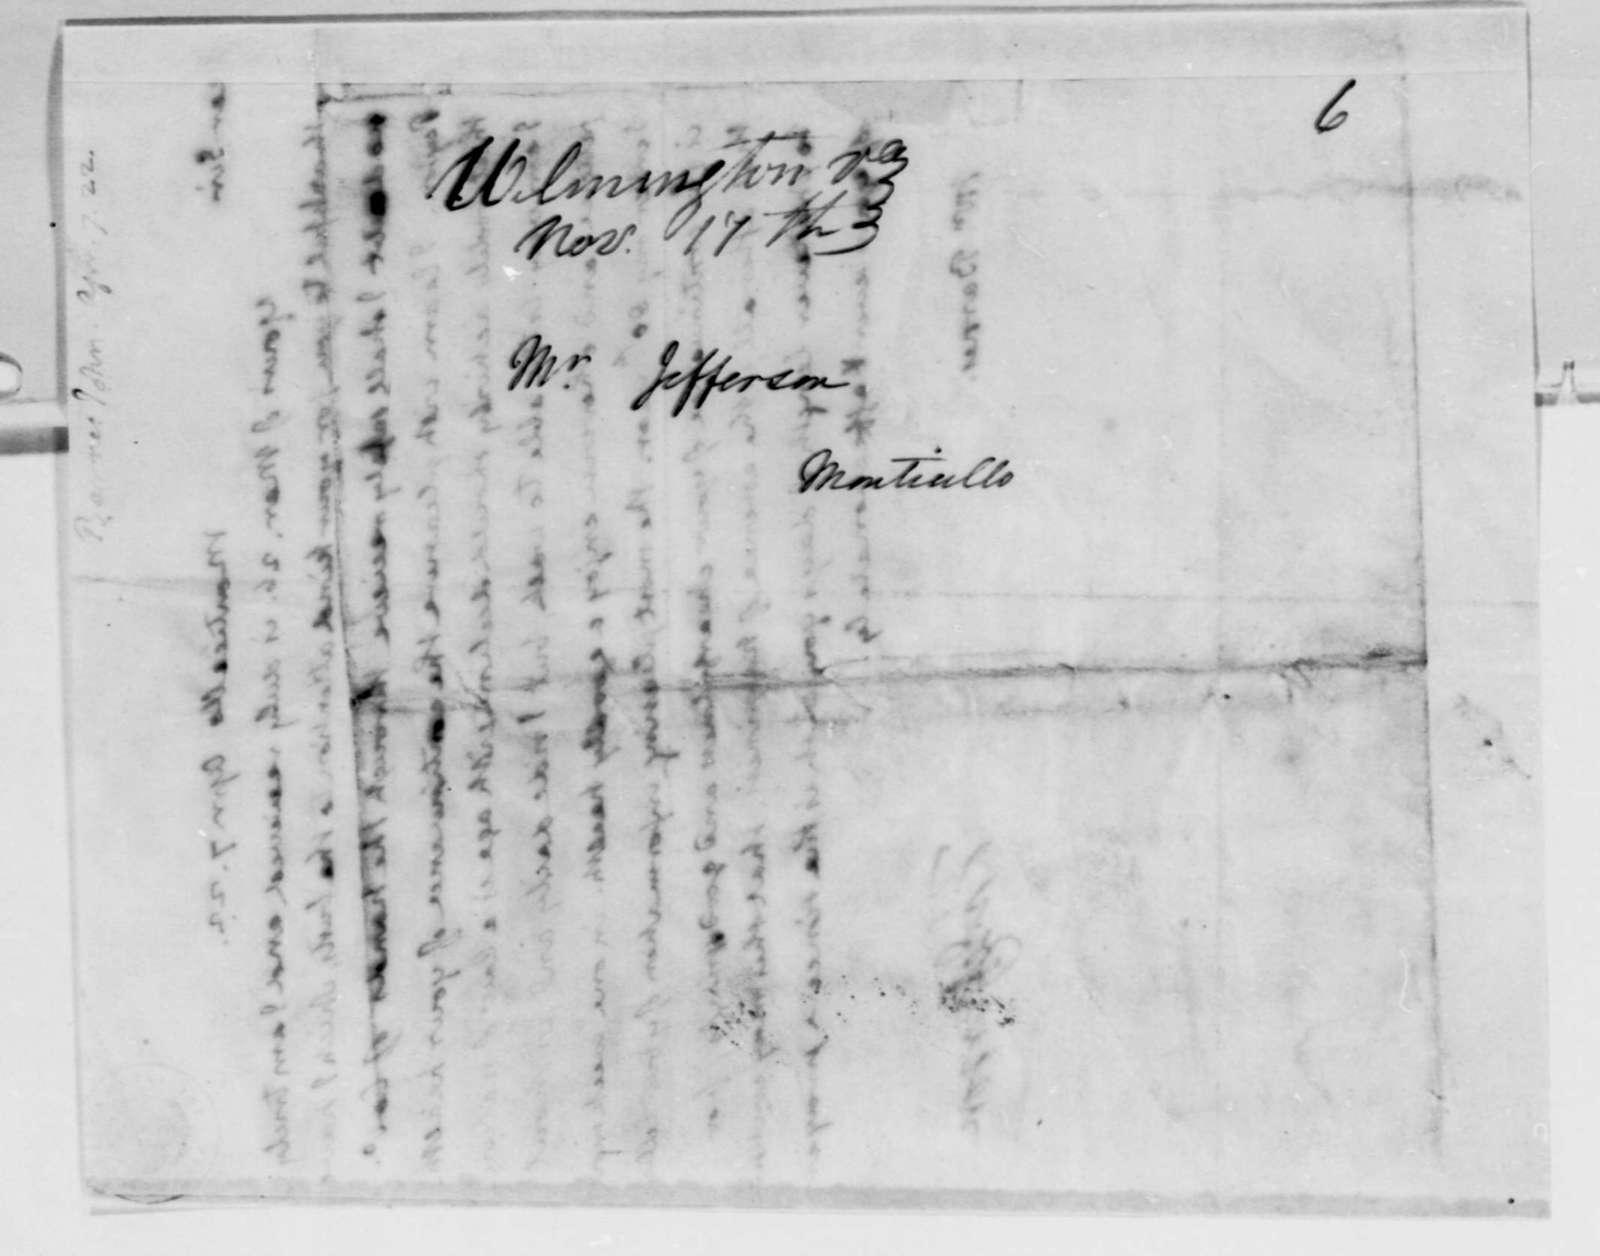 Thomas Jefferson to John S. Barnes, April 7, 1822